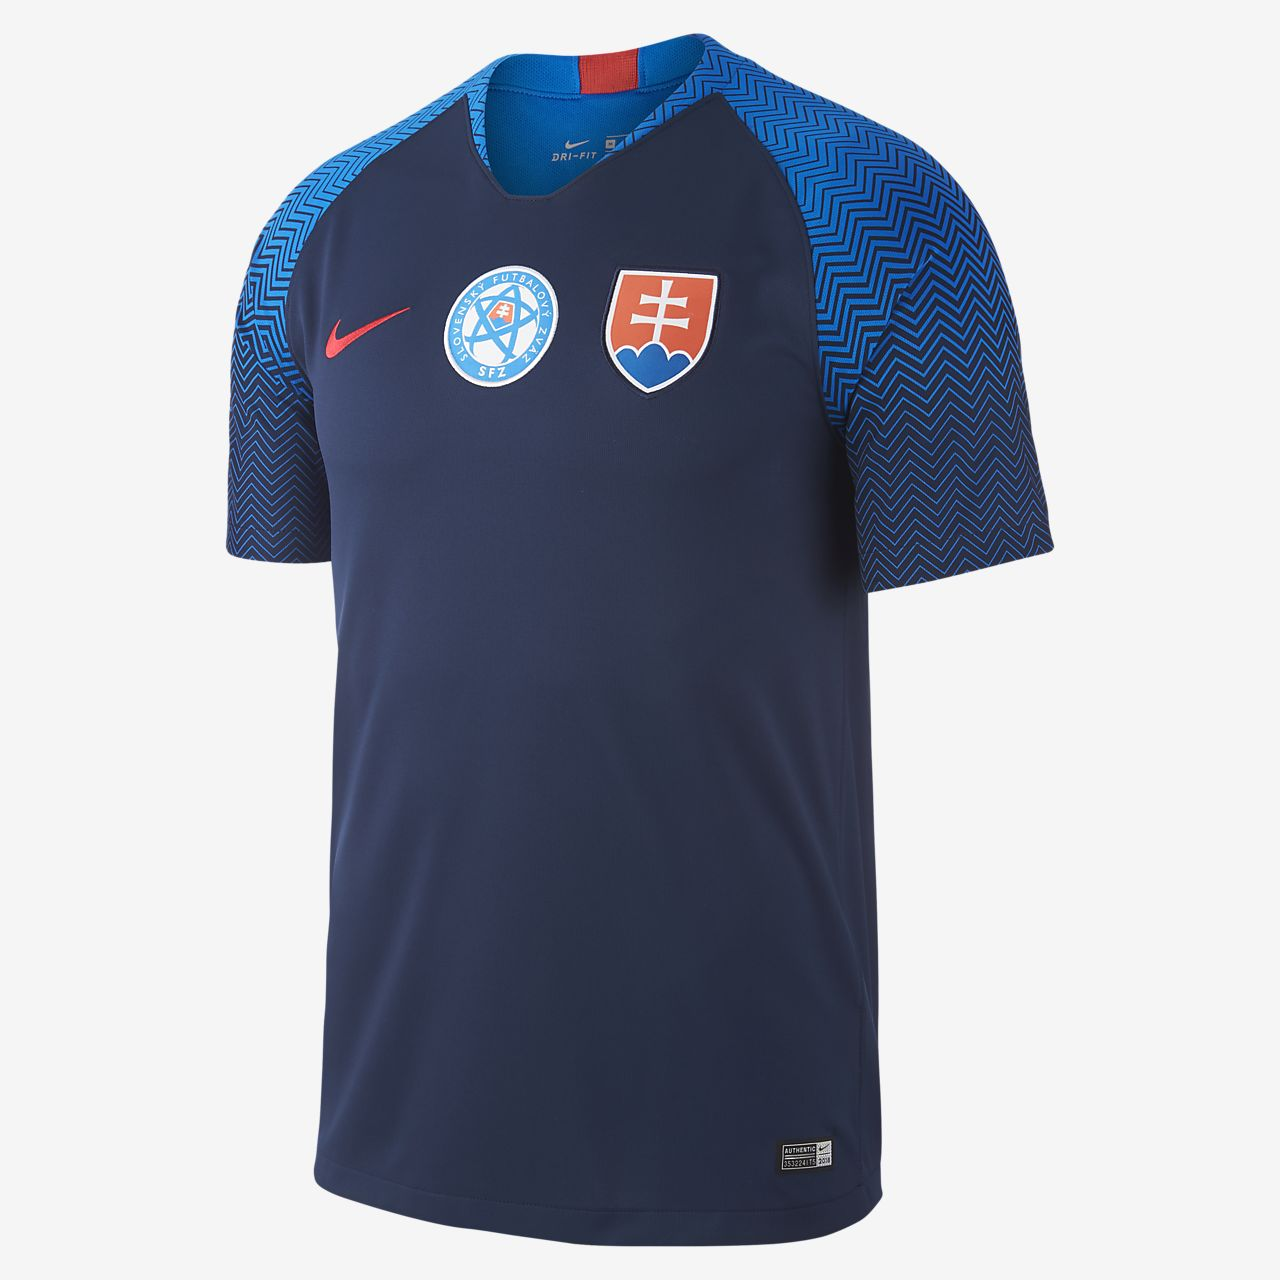 Camiseta de fútbol para hombre 2018 Slovakia Stadium Away